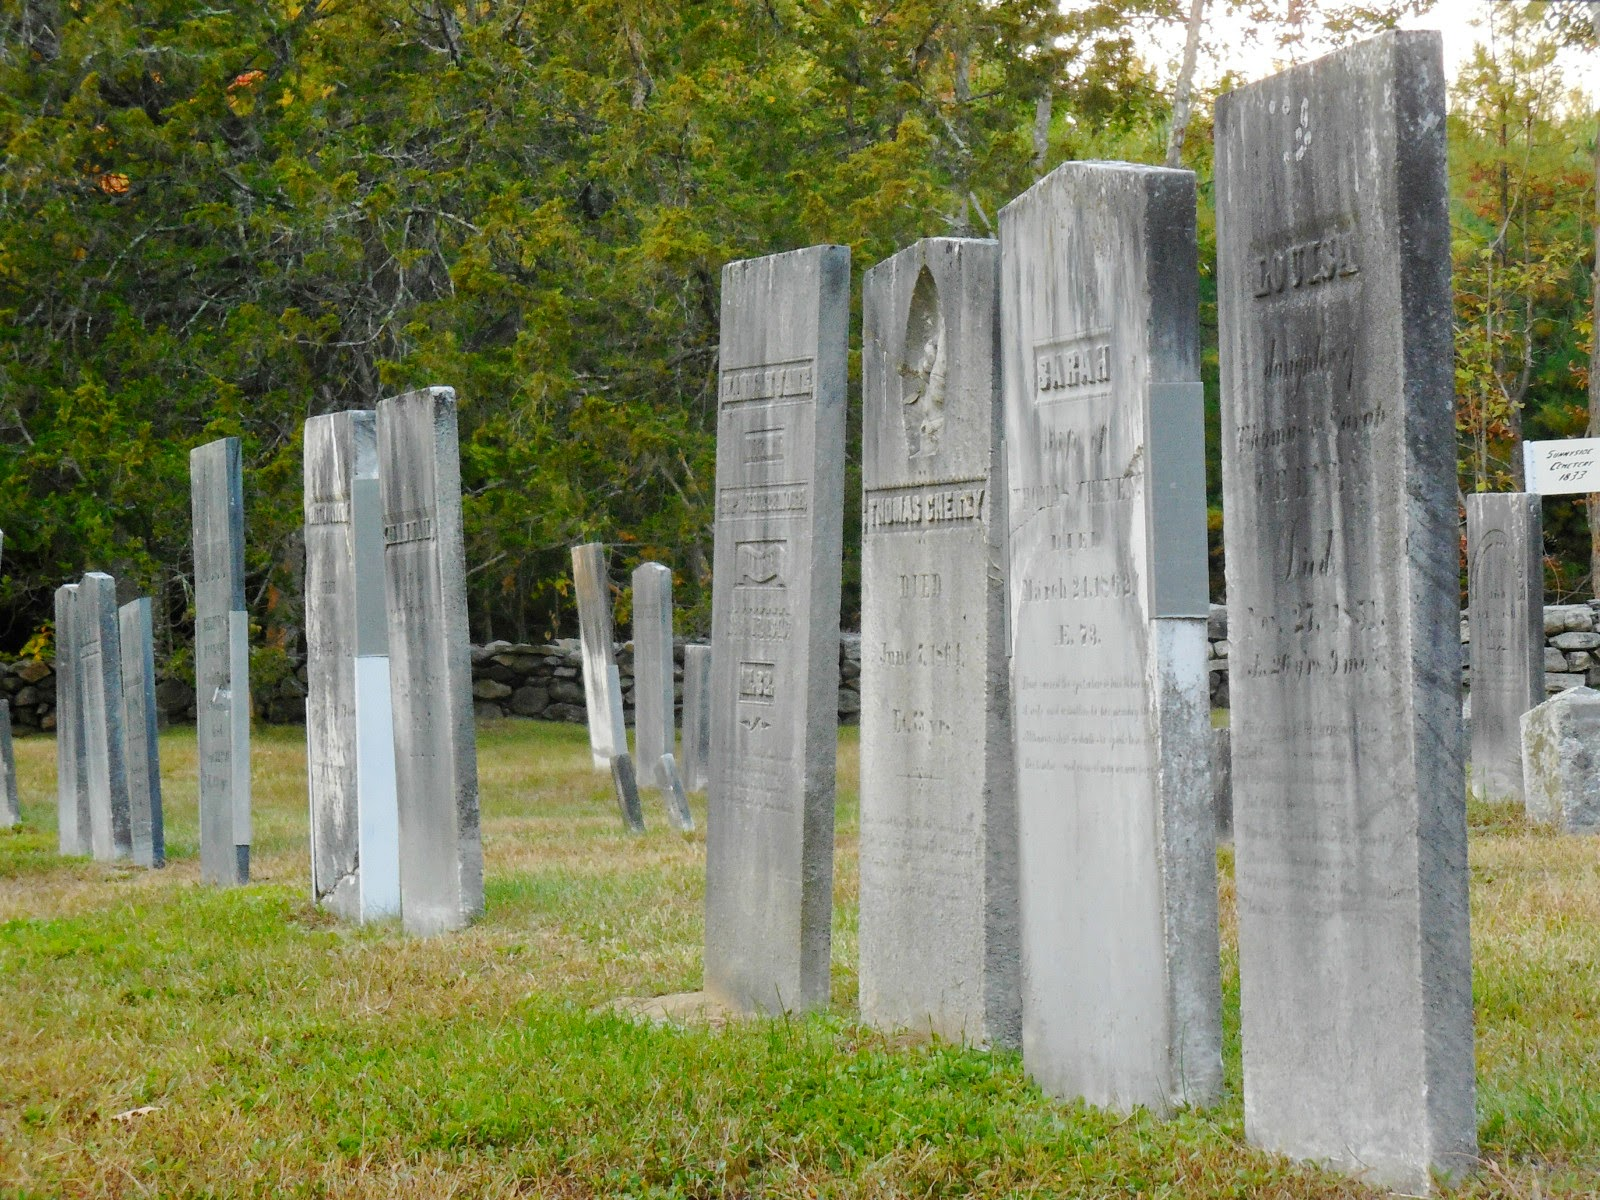 Sunnyside Cemetery, Londonderry, NH